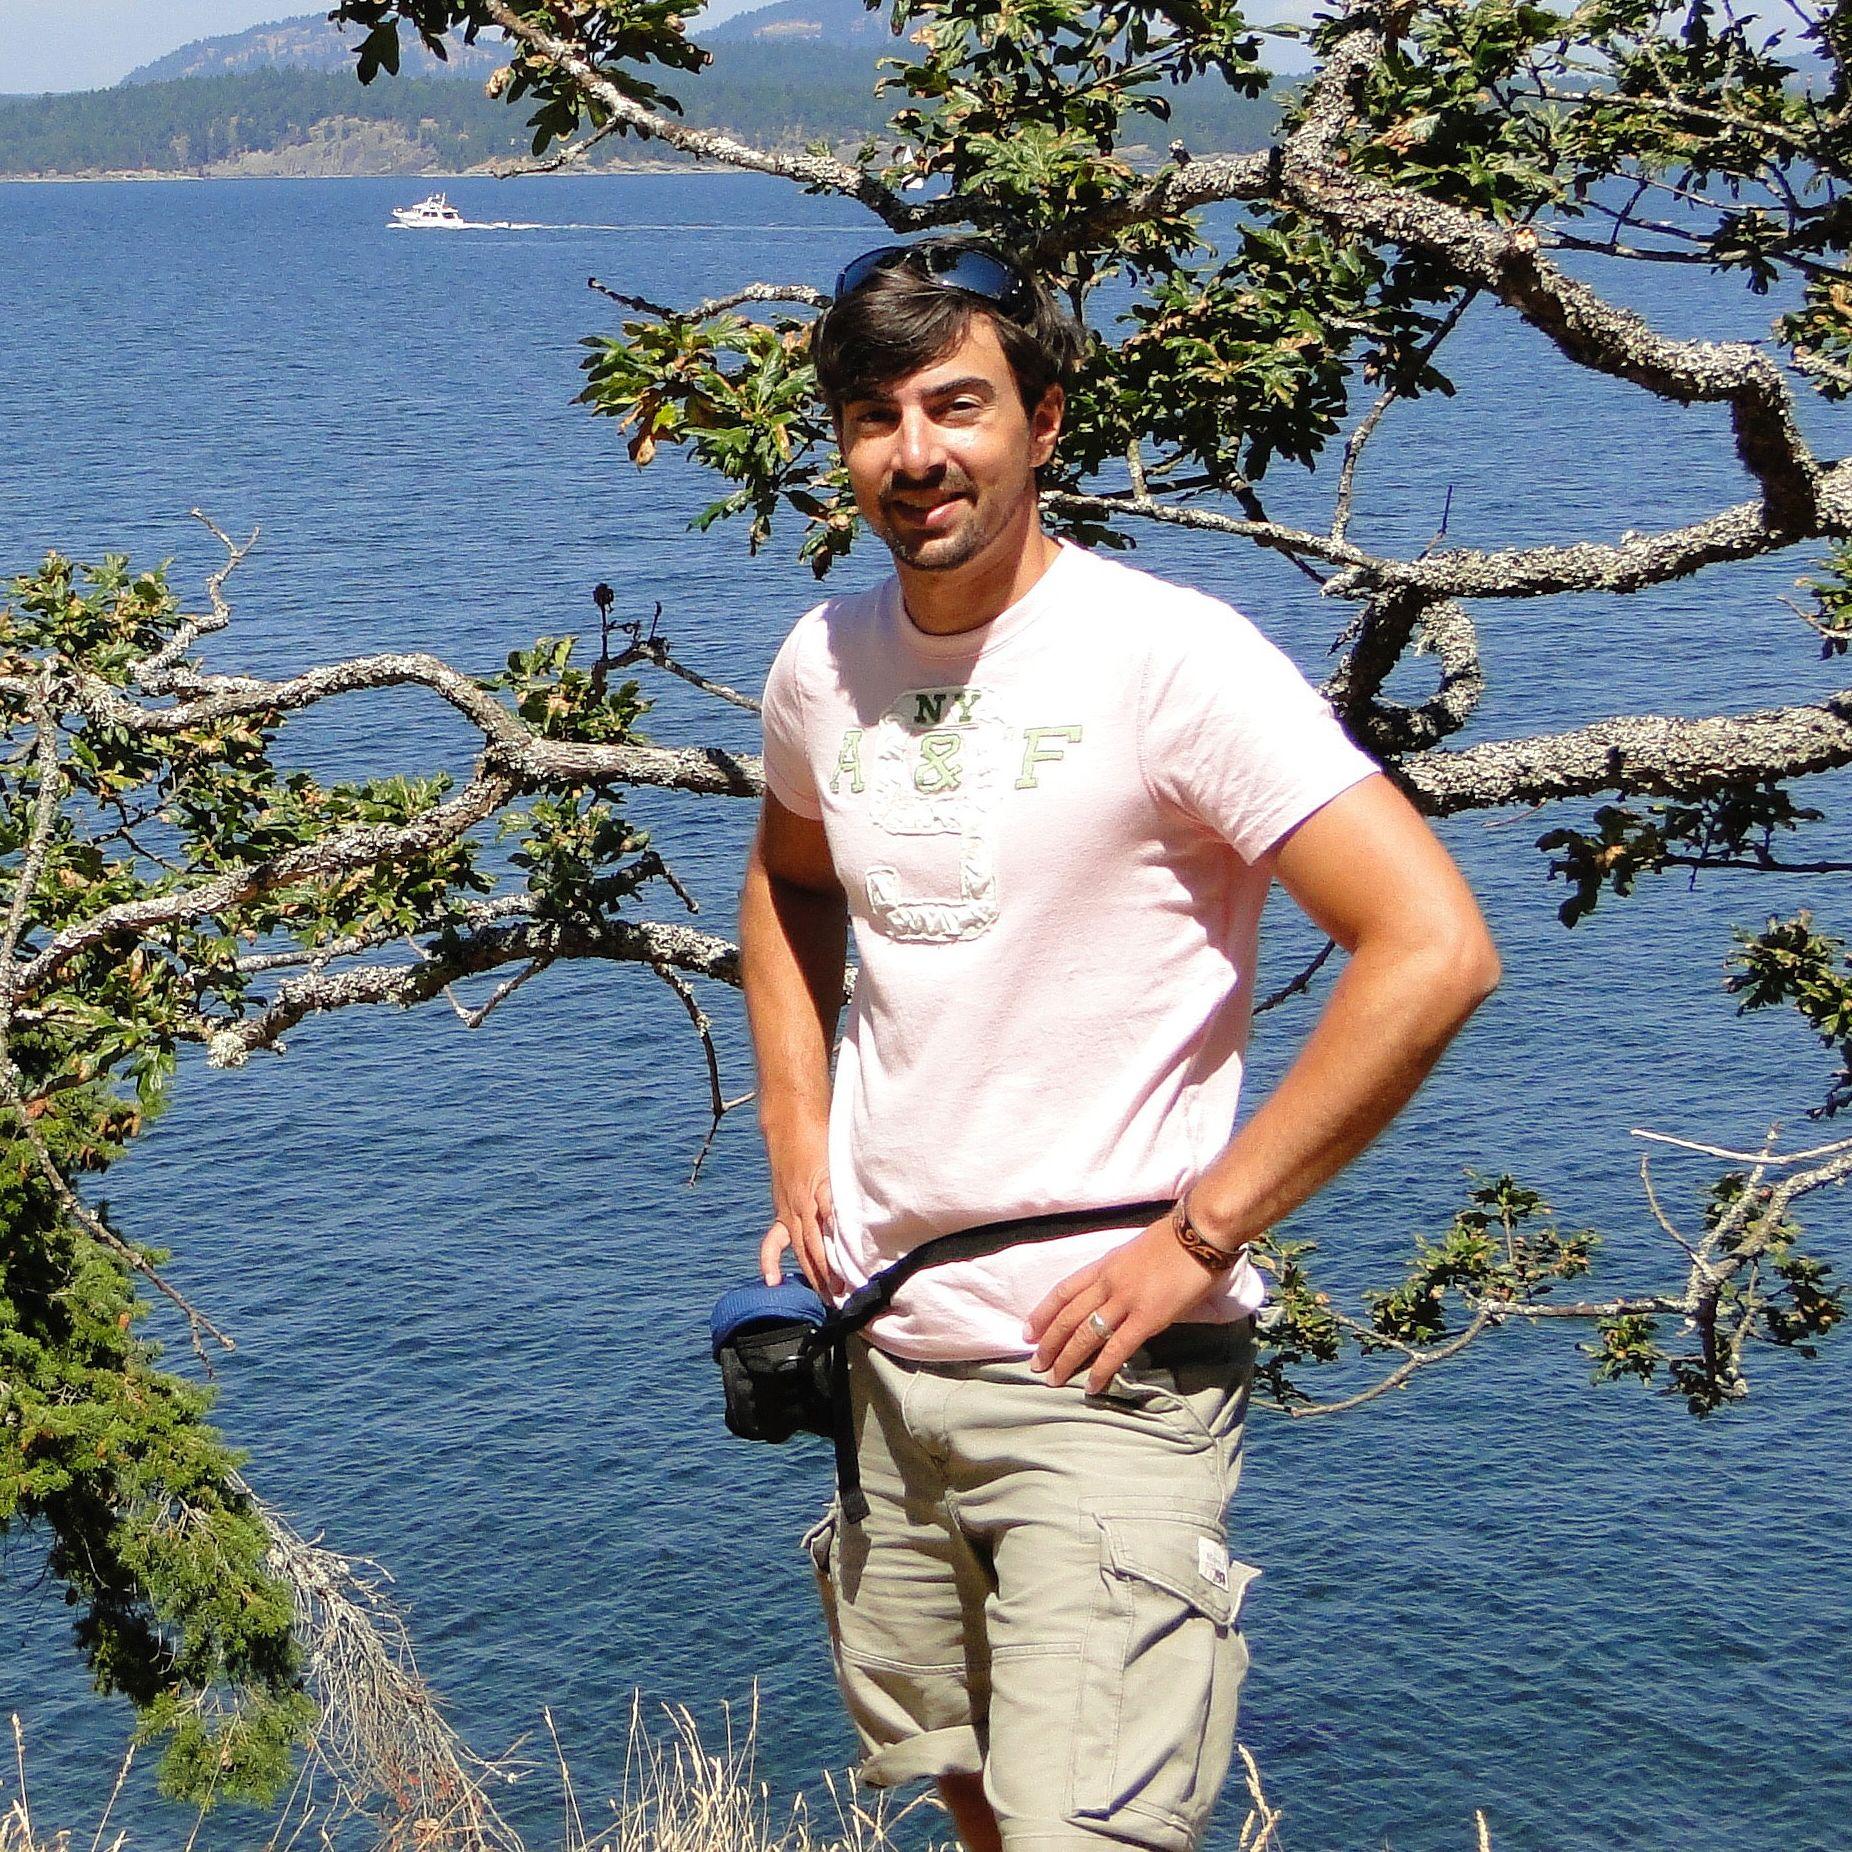 Kolja auf der Insel Salt Spring Island, British Columbia